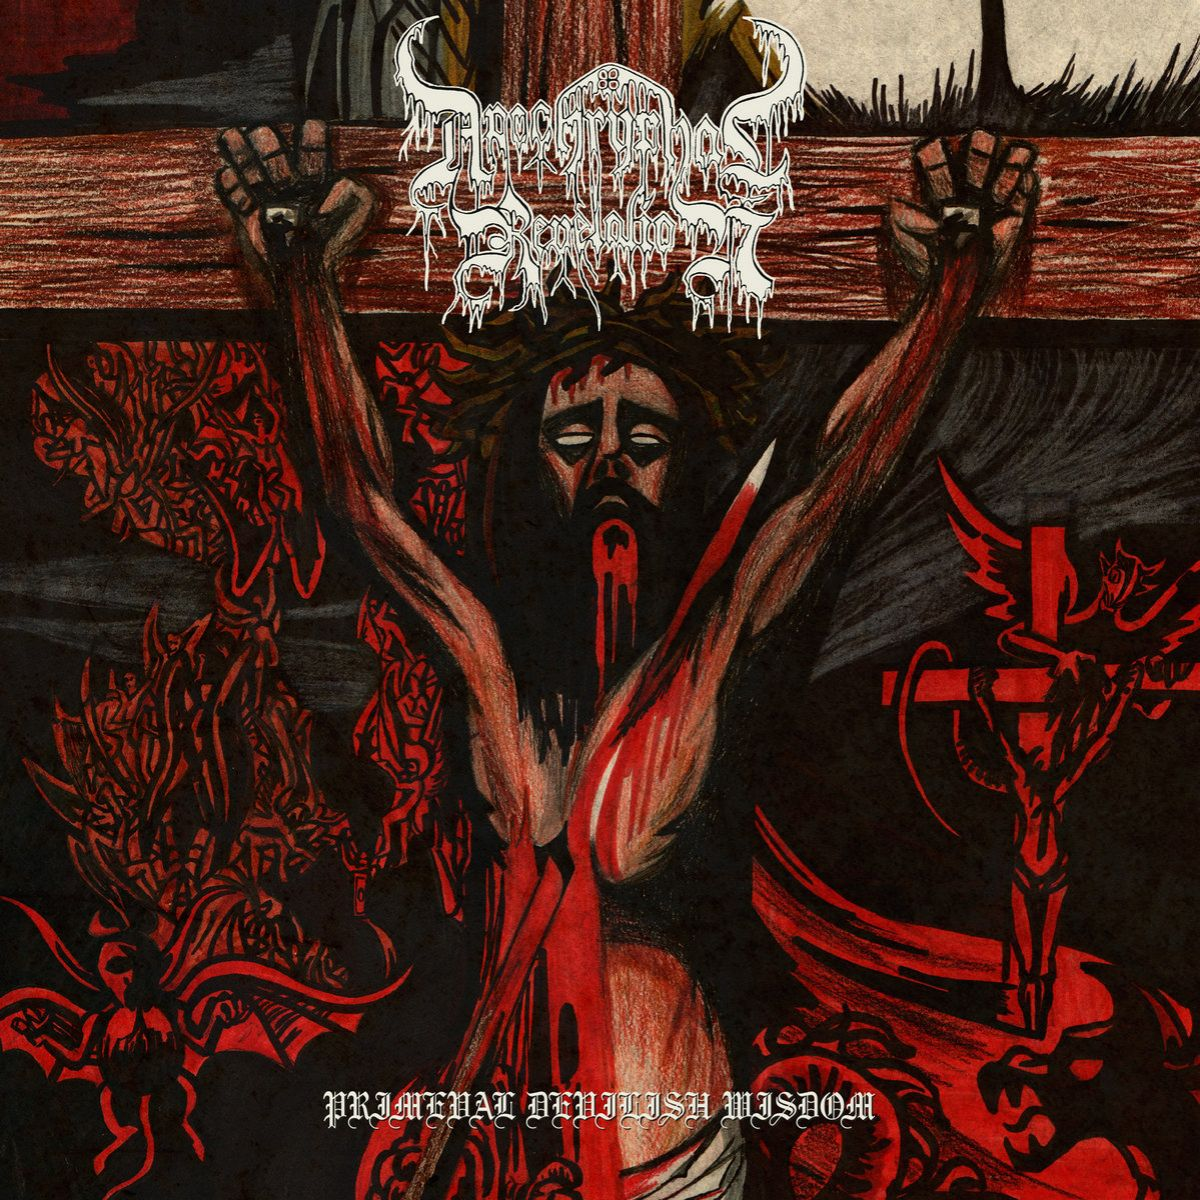 Review for Apochryphal Revelation - Primeval Devilish Wisdom